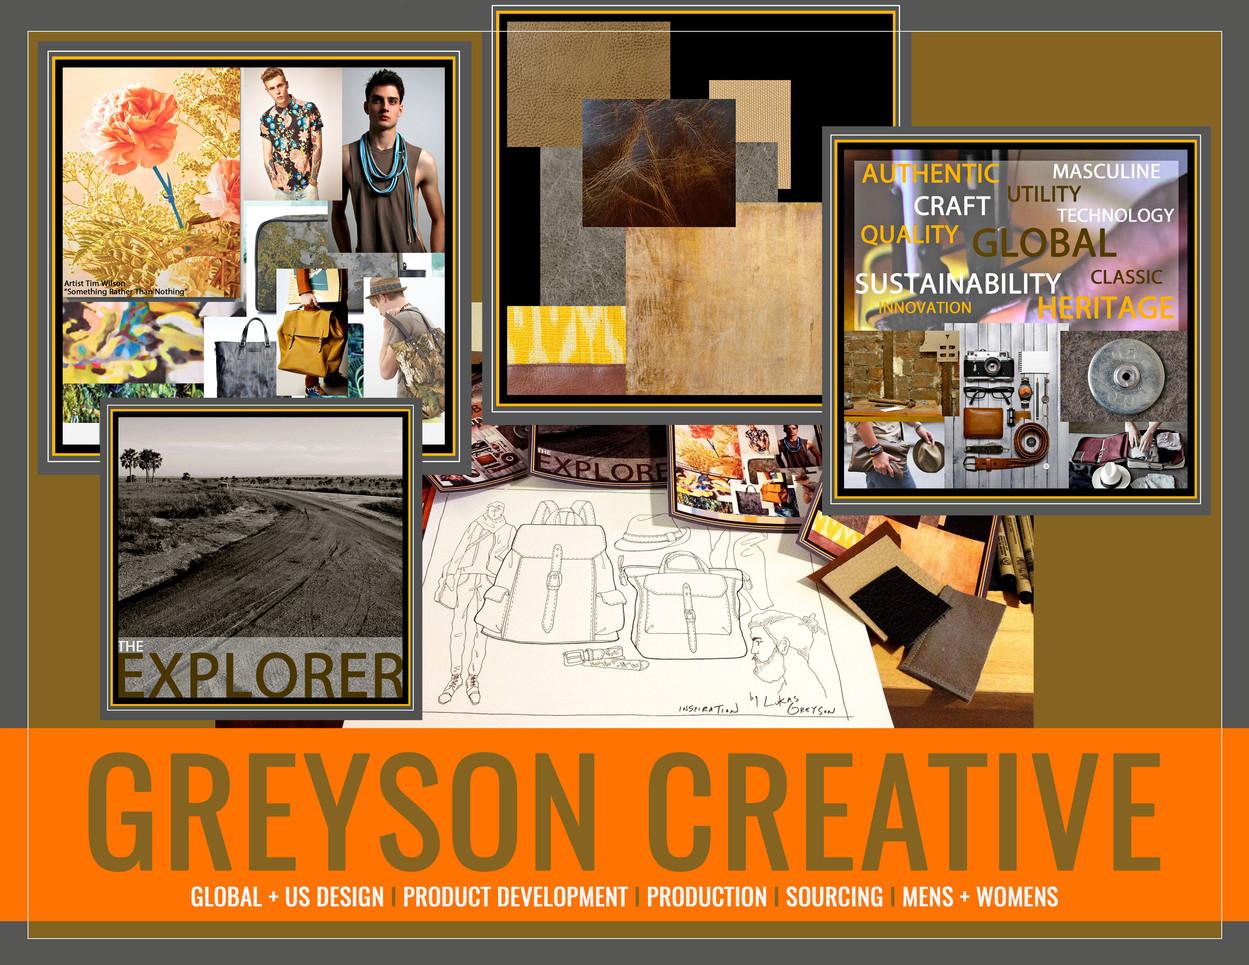 Greyson Creative by Lukas Greyson